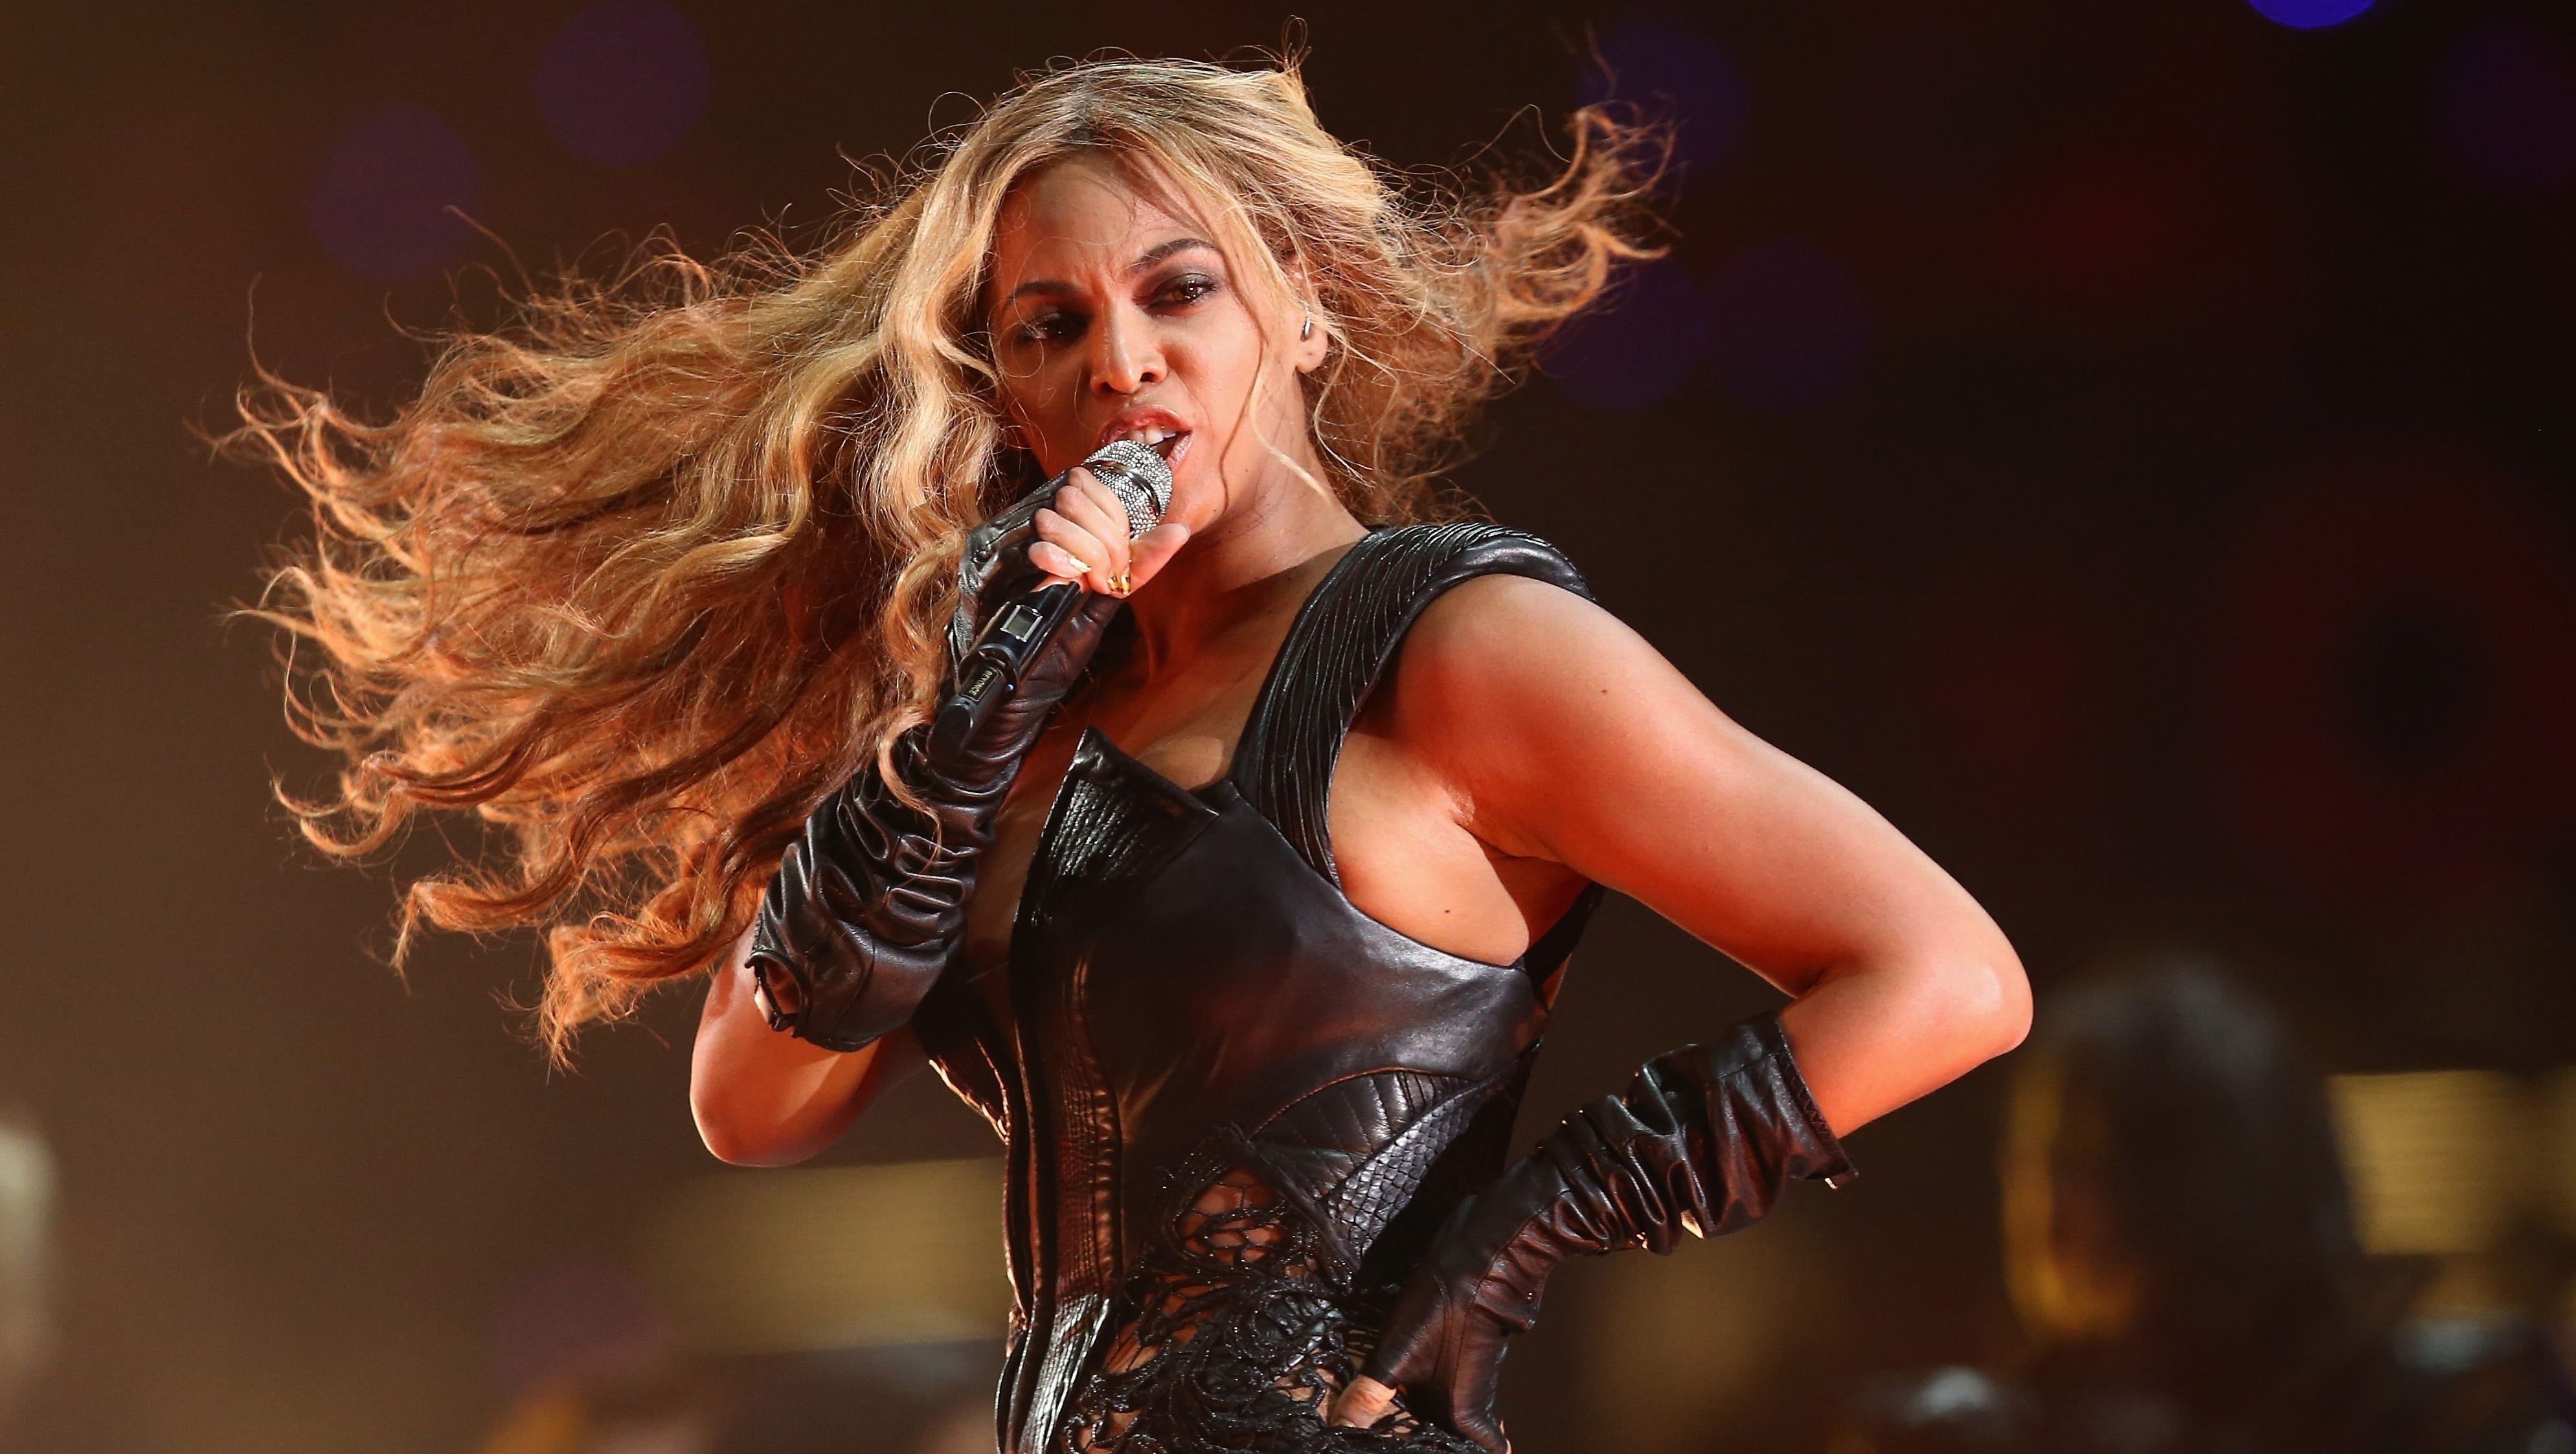 Beyonce Sings Live, Dominates Super Bowl Xlvii Halftime with regard to Beyonce Super Bowl 2013